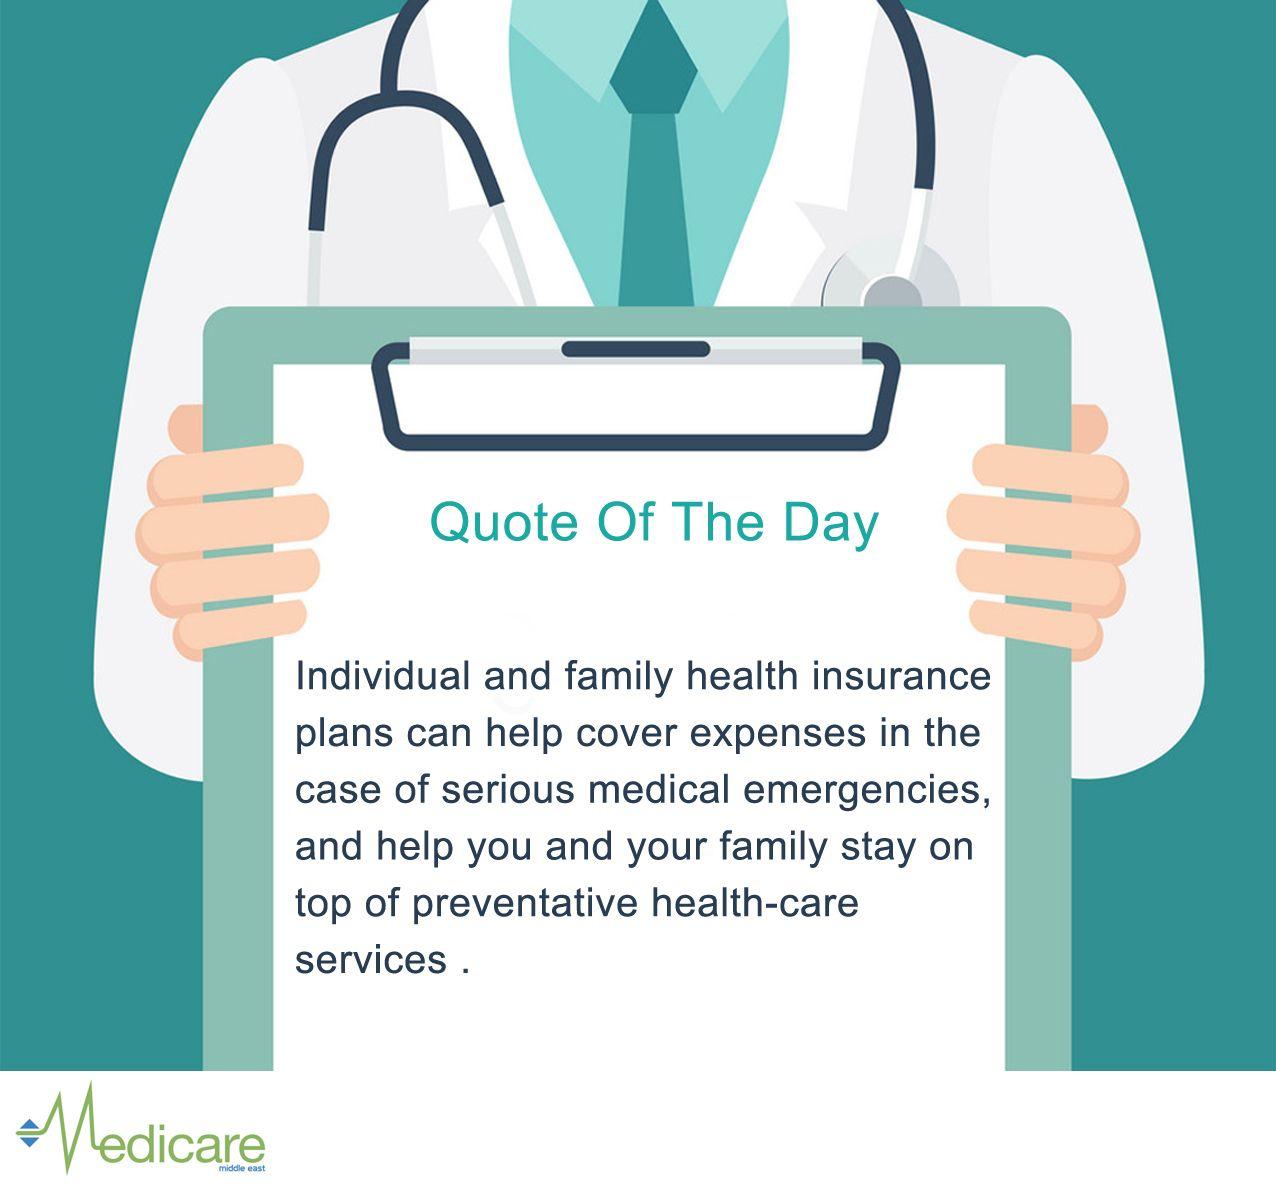 Medical insurance company in Egypt , medicare providing